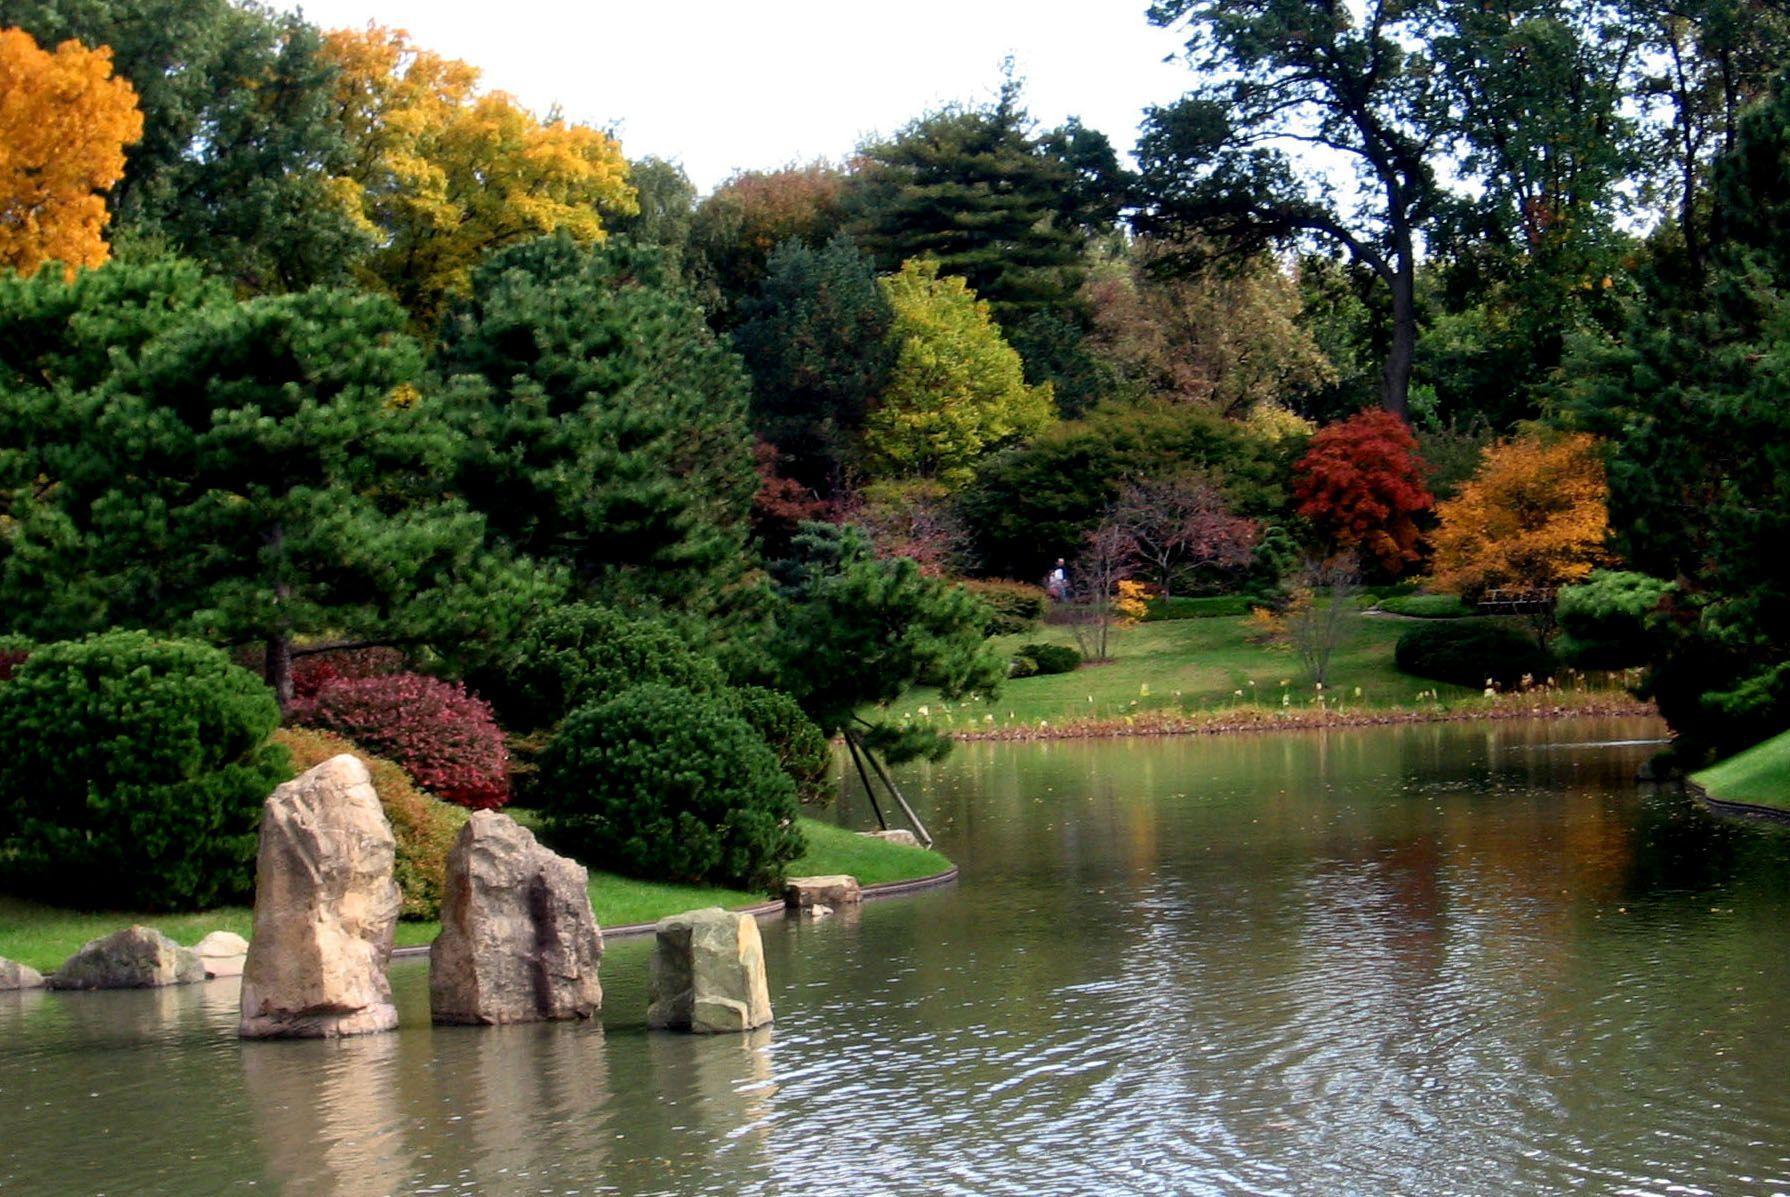 aa796c998df4e02c31722b91a3c31fd0 - Best Time To Visit Missouri Botanical Gardens